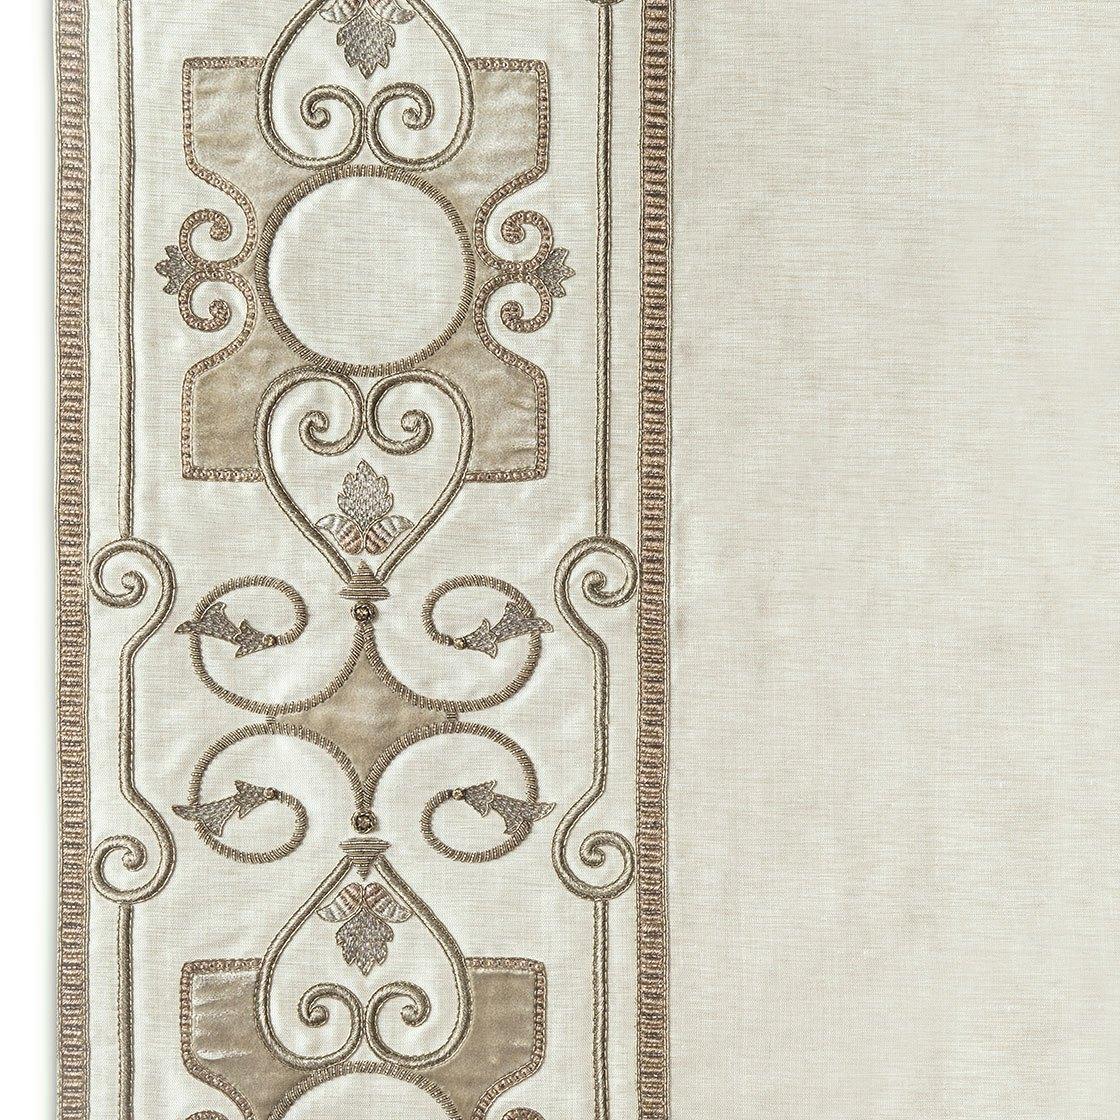 Cordoba on Lagan silk - Parmasan - Beaumont & Fletcher - Beaumont & Fletcher